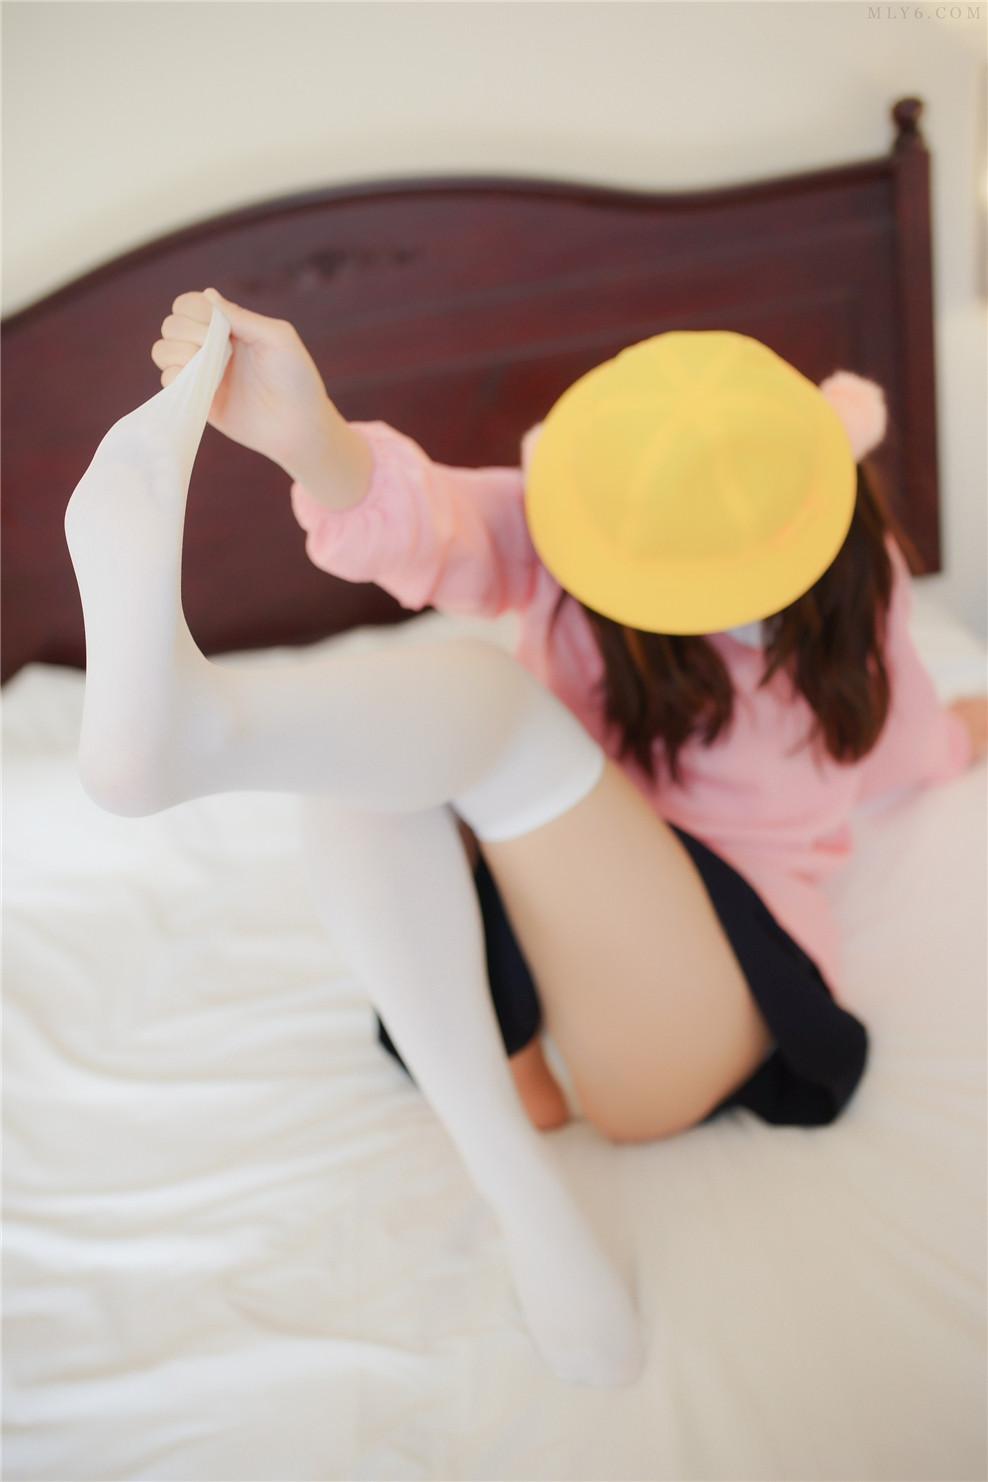 少女映画 – NO.087 幼稚园 [31P][27.5MB]